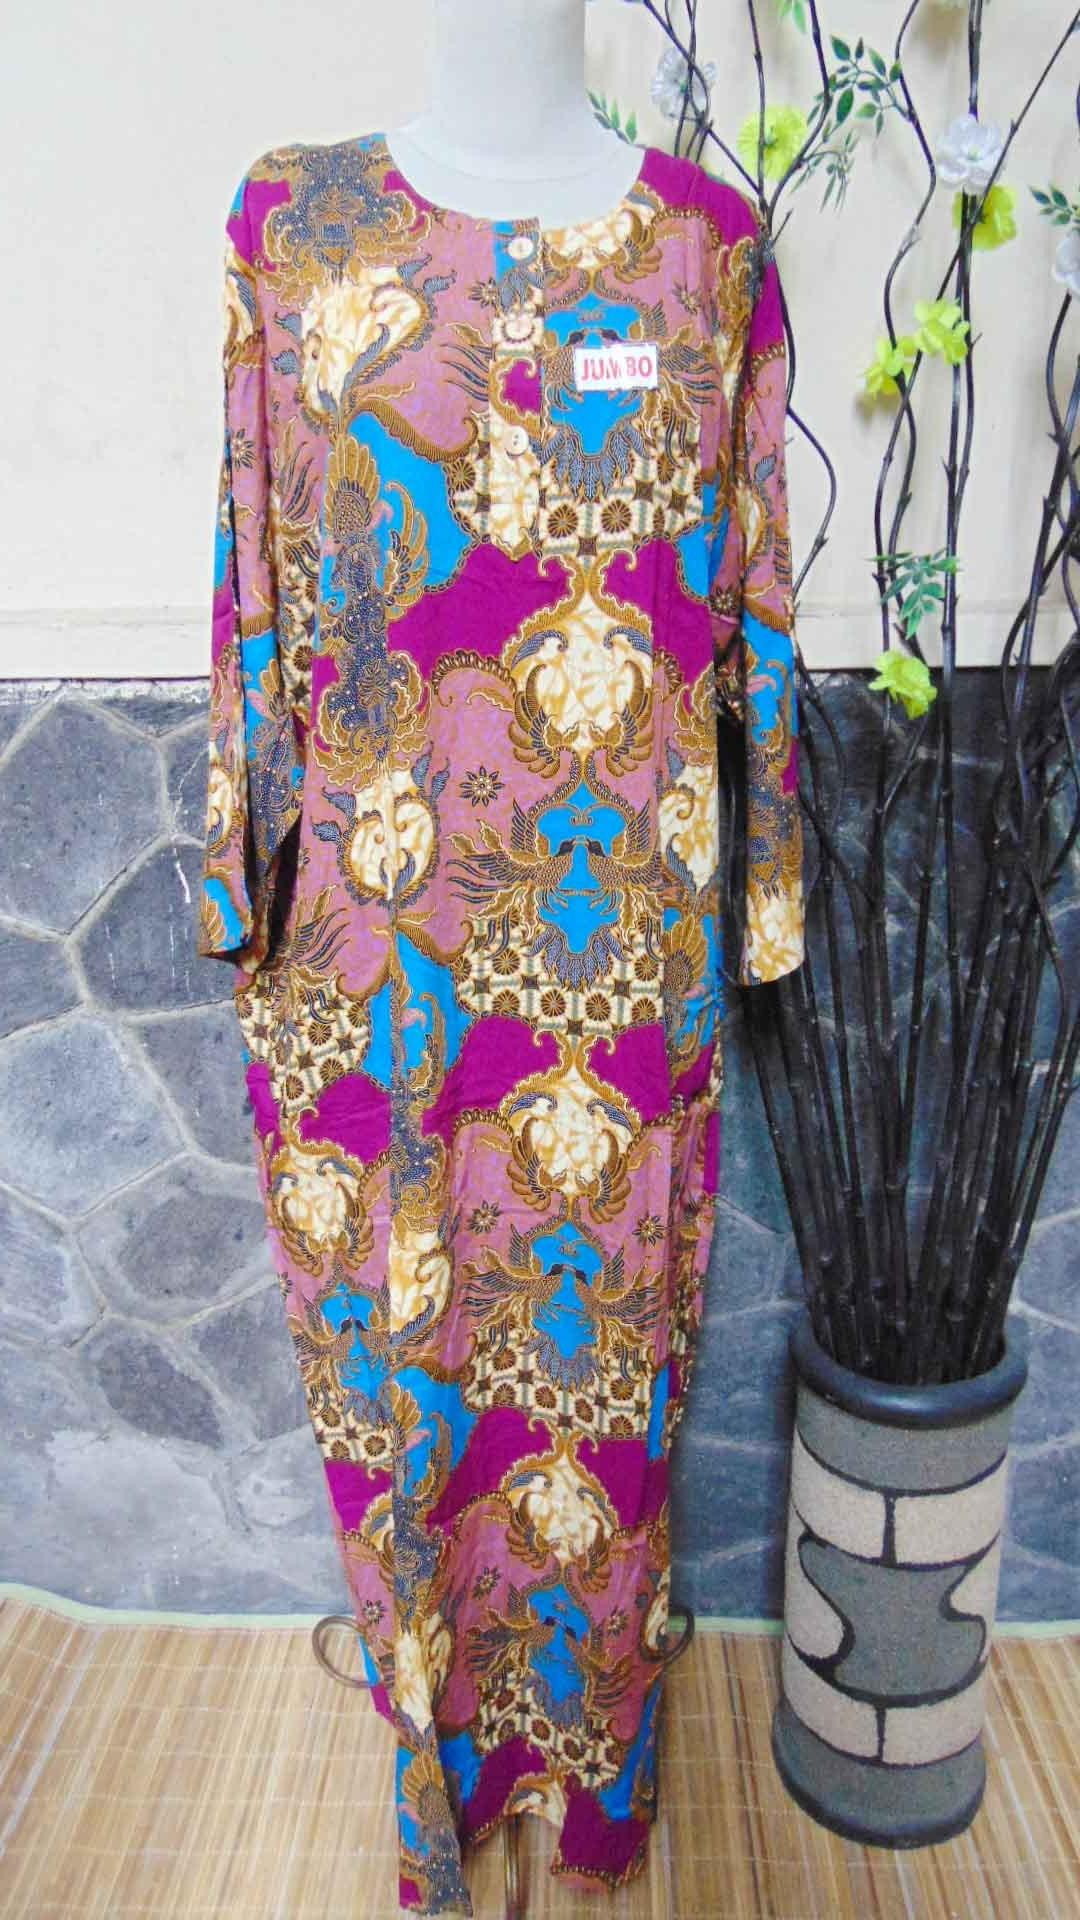 baju tidur santai batik longdress jumbo cantik daster lengan panjang wanita longdres baladewa motif batik Ungu